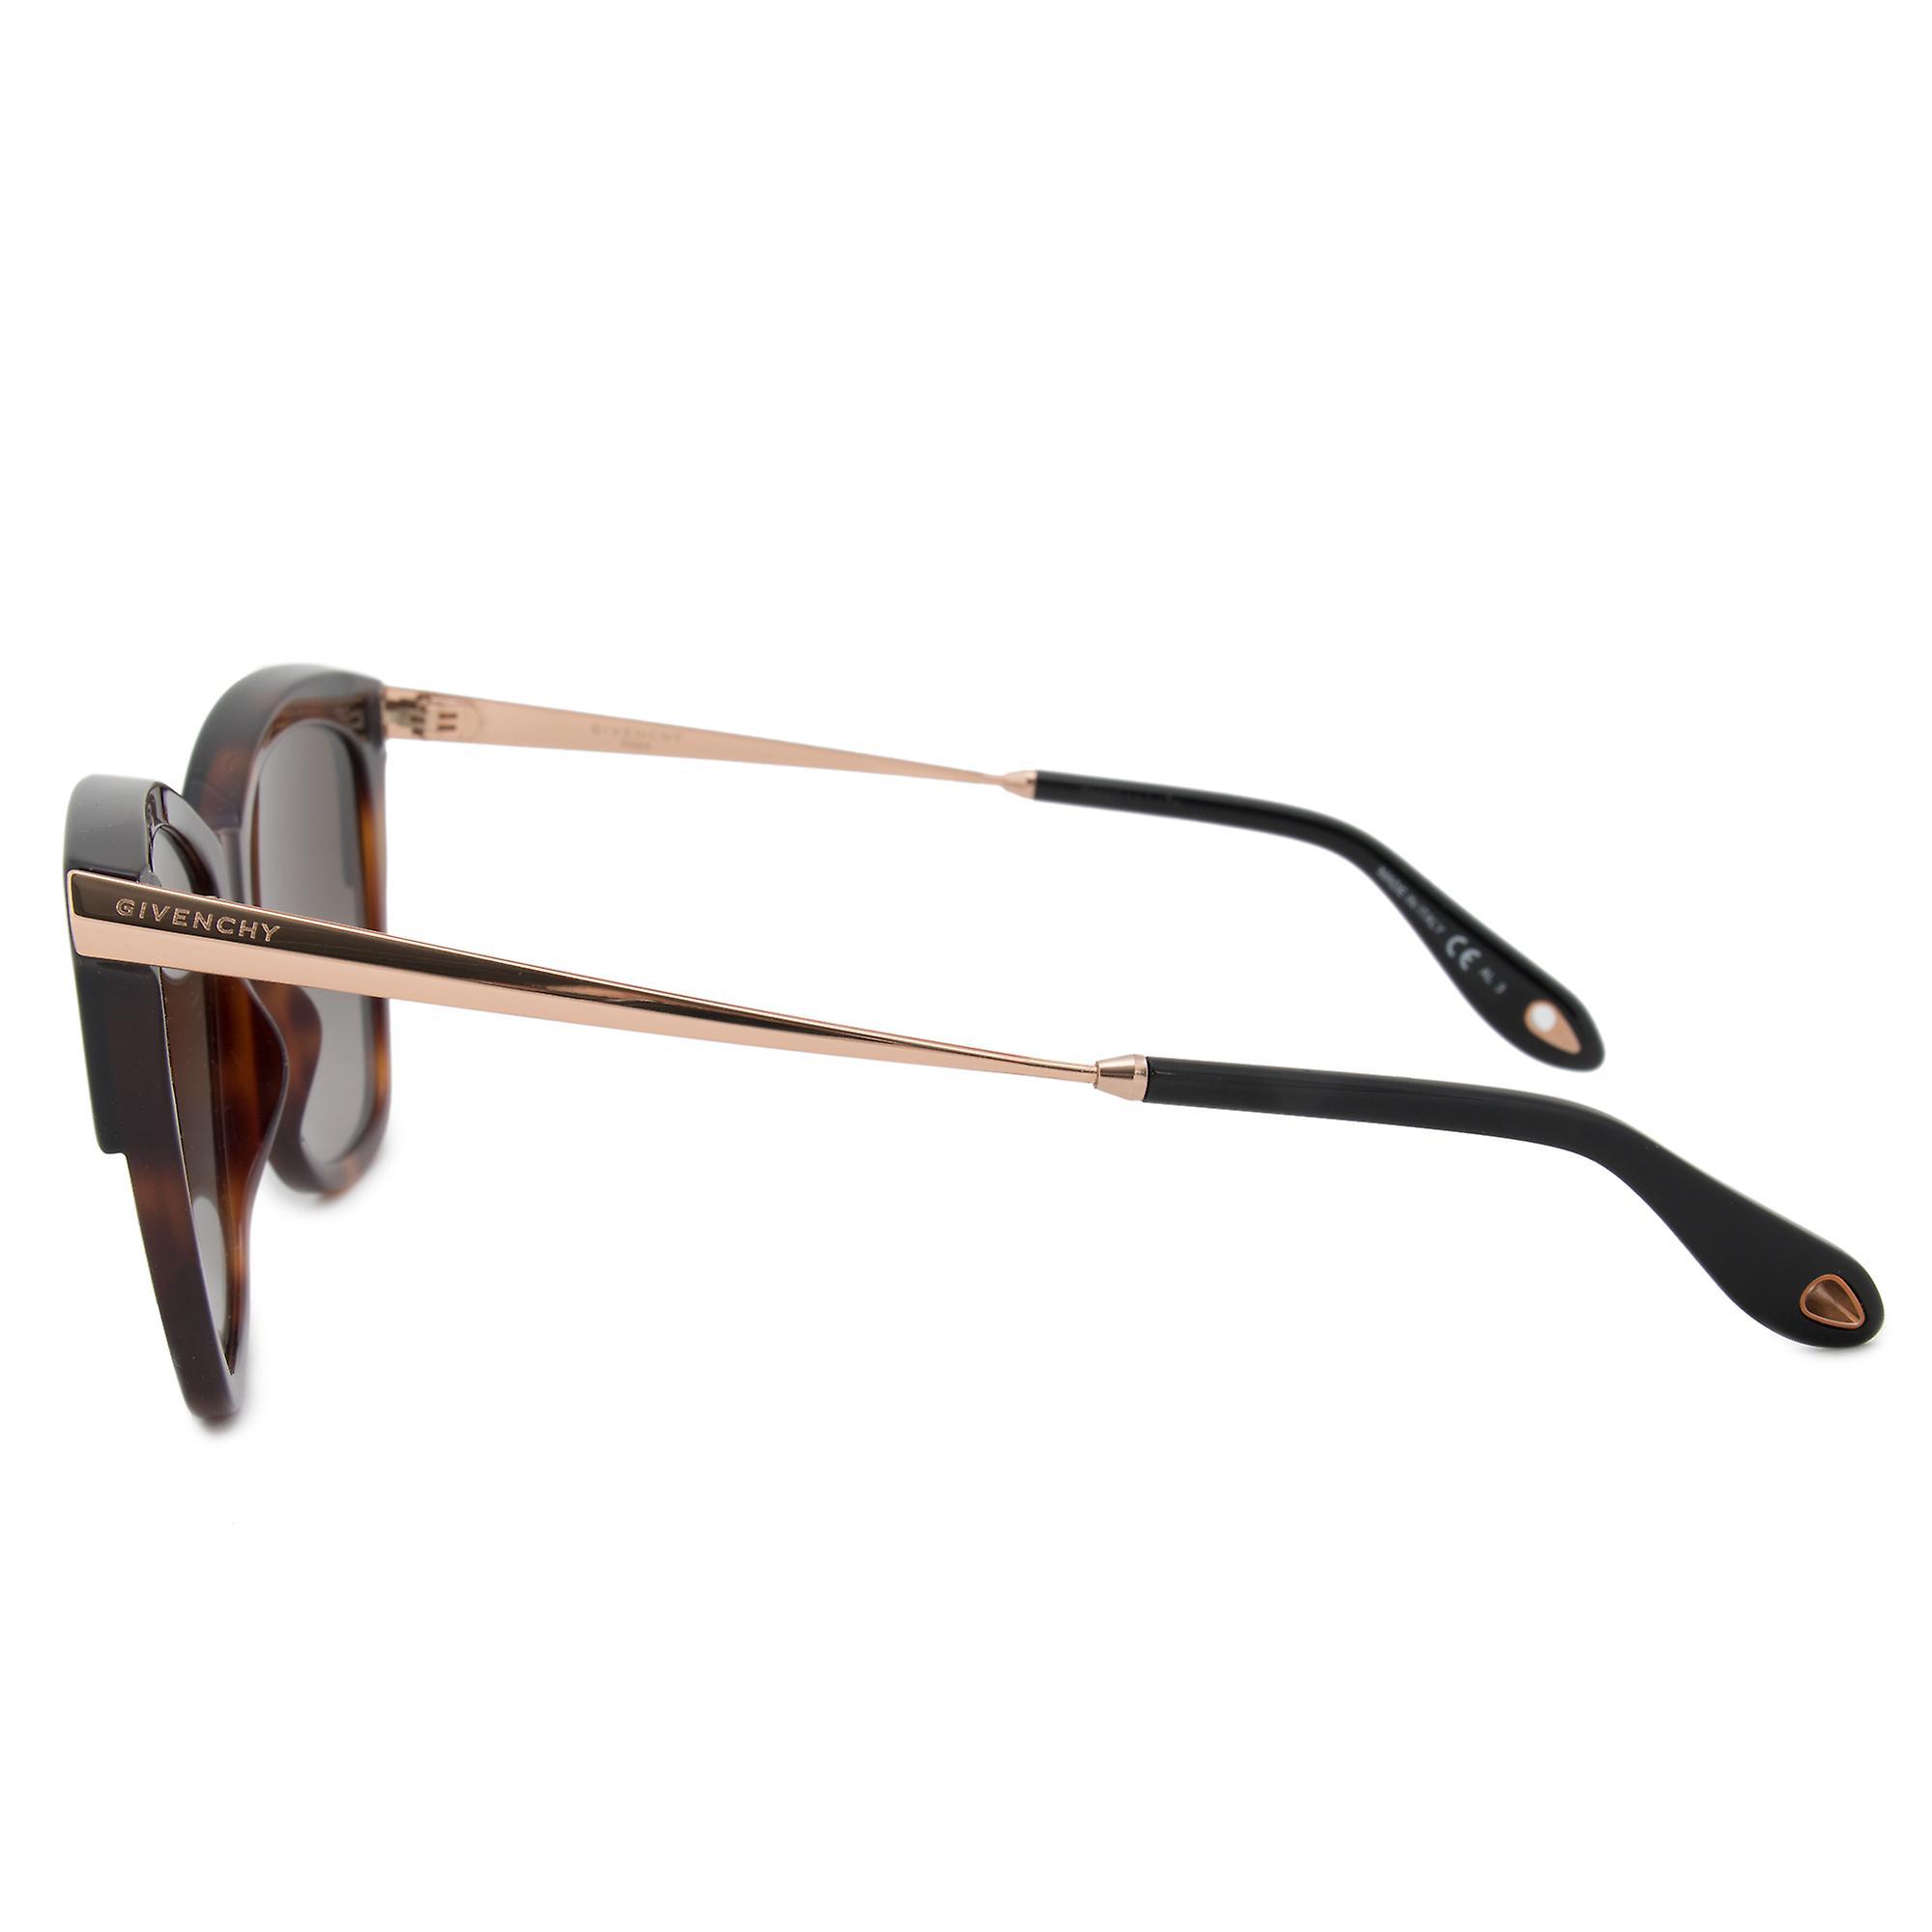 Givenchy Cat Eye Sunglasses GV7071/S WR7 HA 57